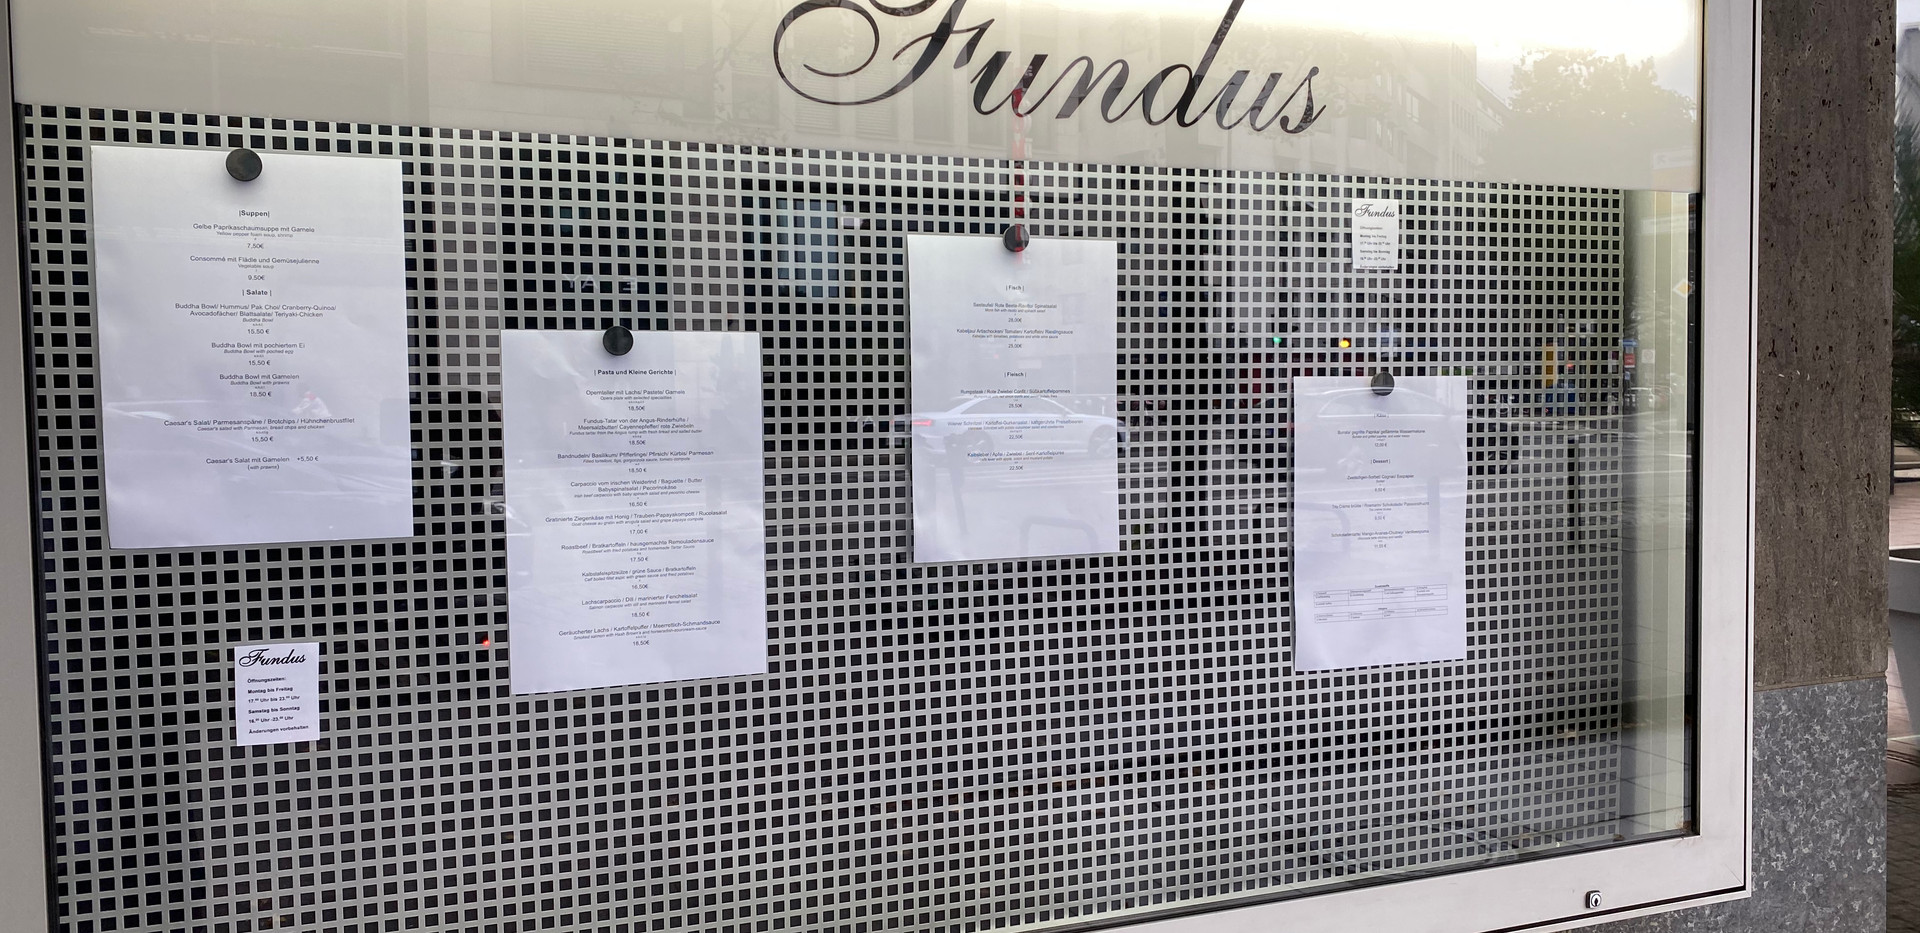 Resturant Funudus Frankfurt in der Oper